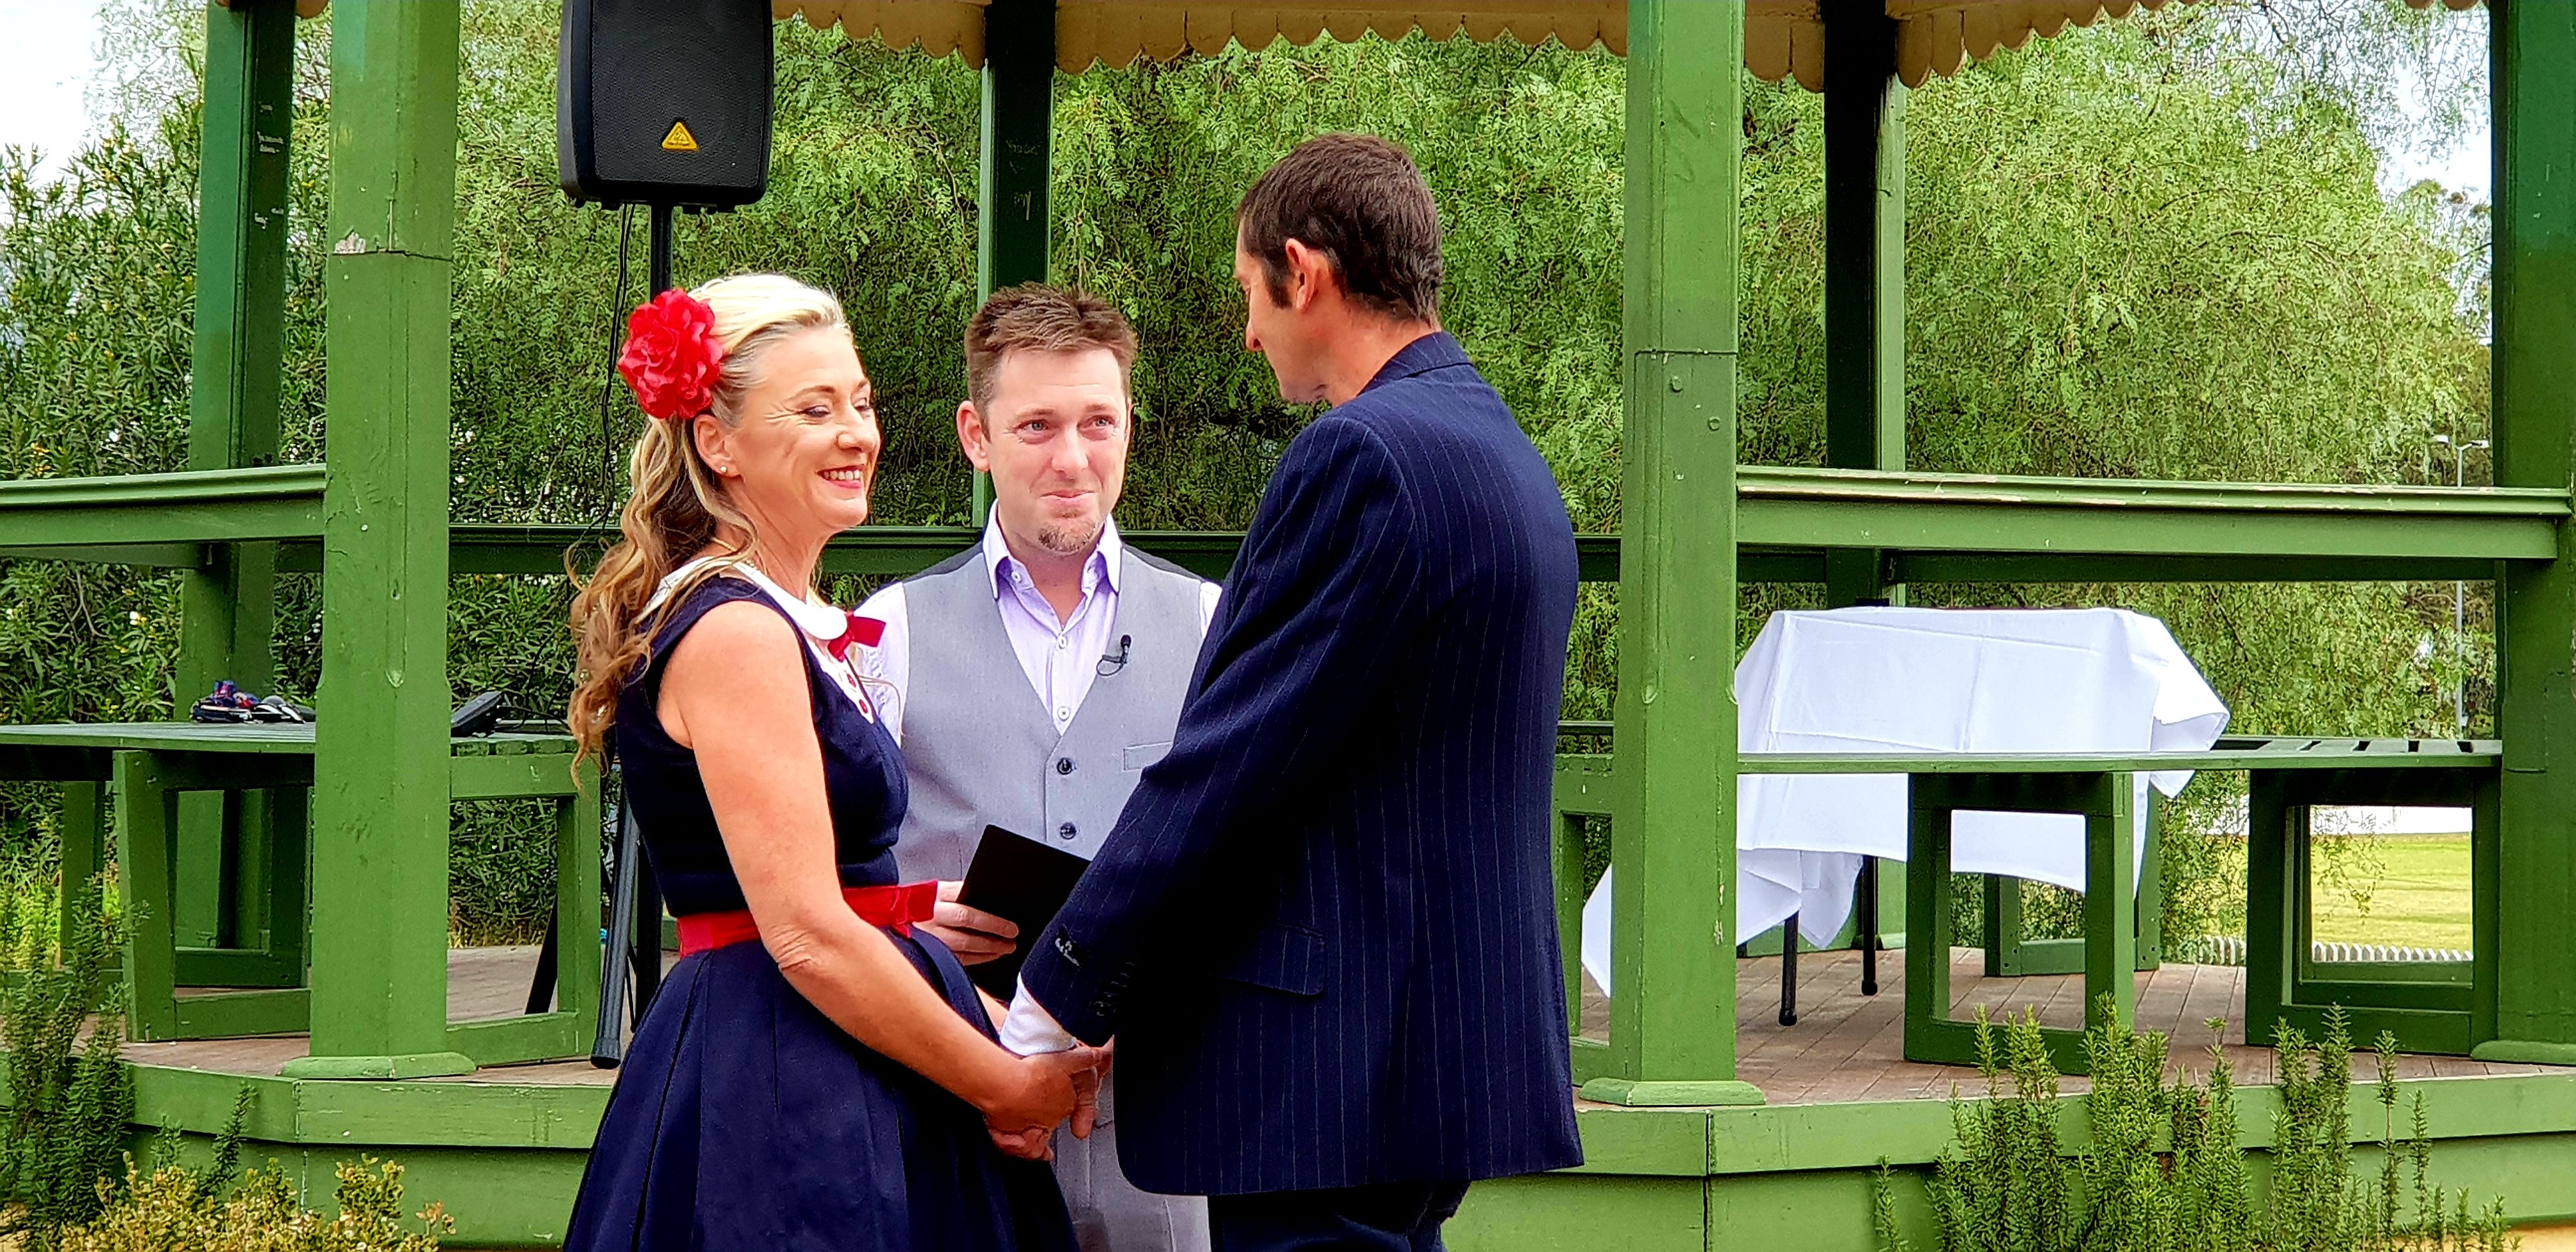 Hawkesbury Celebrant, Small Wedding, Elopement, Male Celebrant, Sydney Celebrant, Fun Ceremony